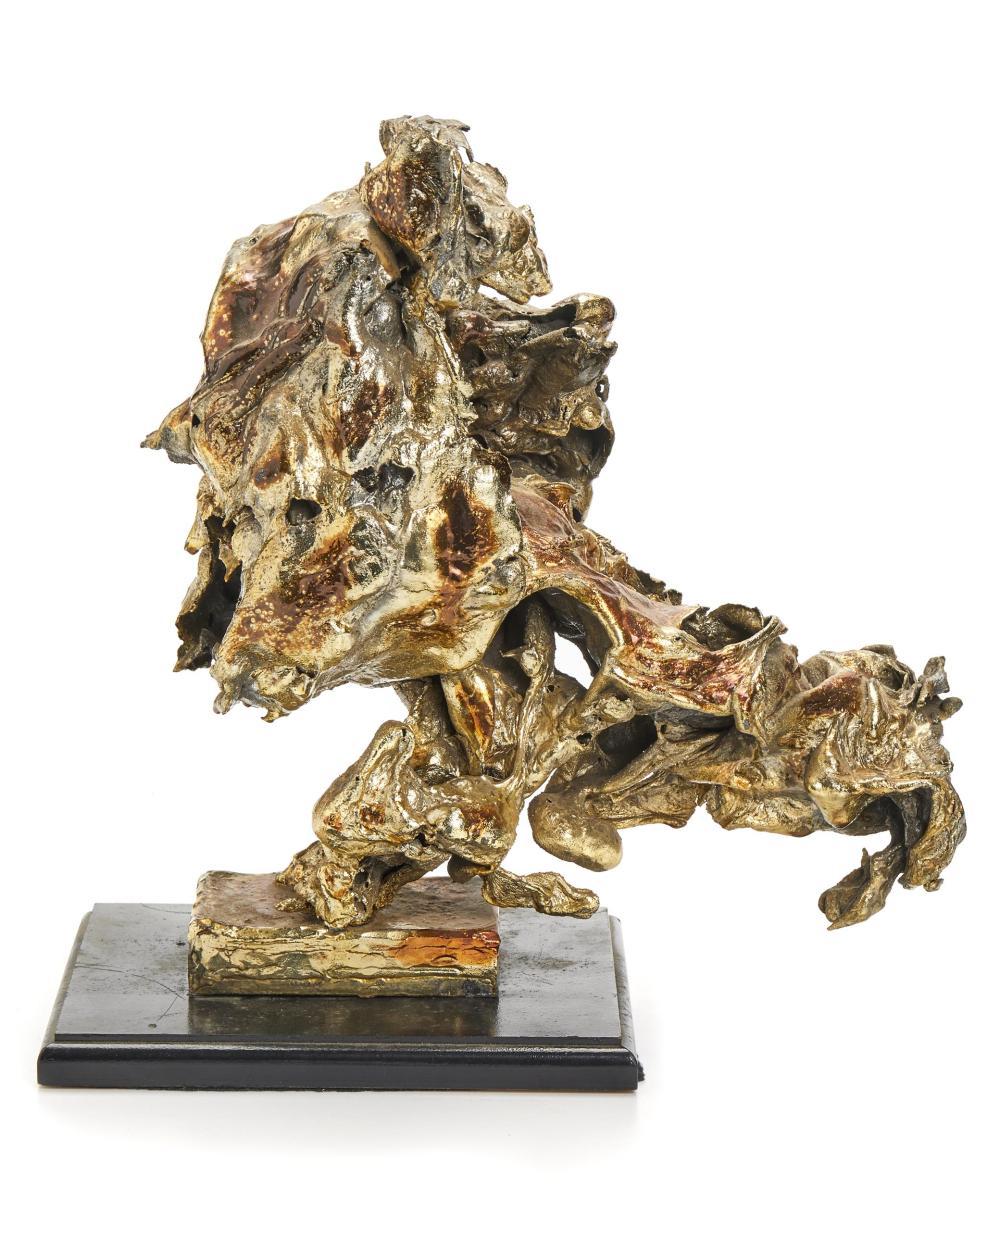 "Sascha Brastoff, (1918-1993, American), Freeform sculpture, Mixed media on wood base, Overall: 13.75"" H x 13"" W x 8.5"" D; Sculpture: 13"